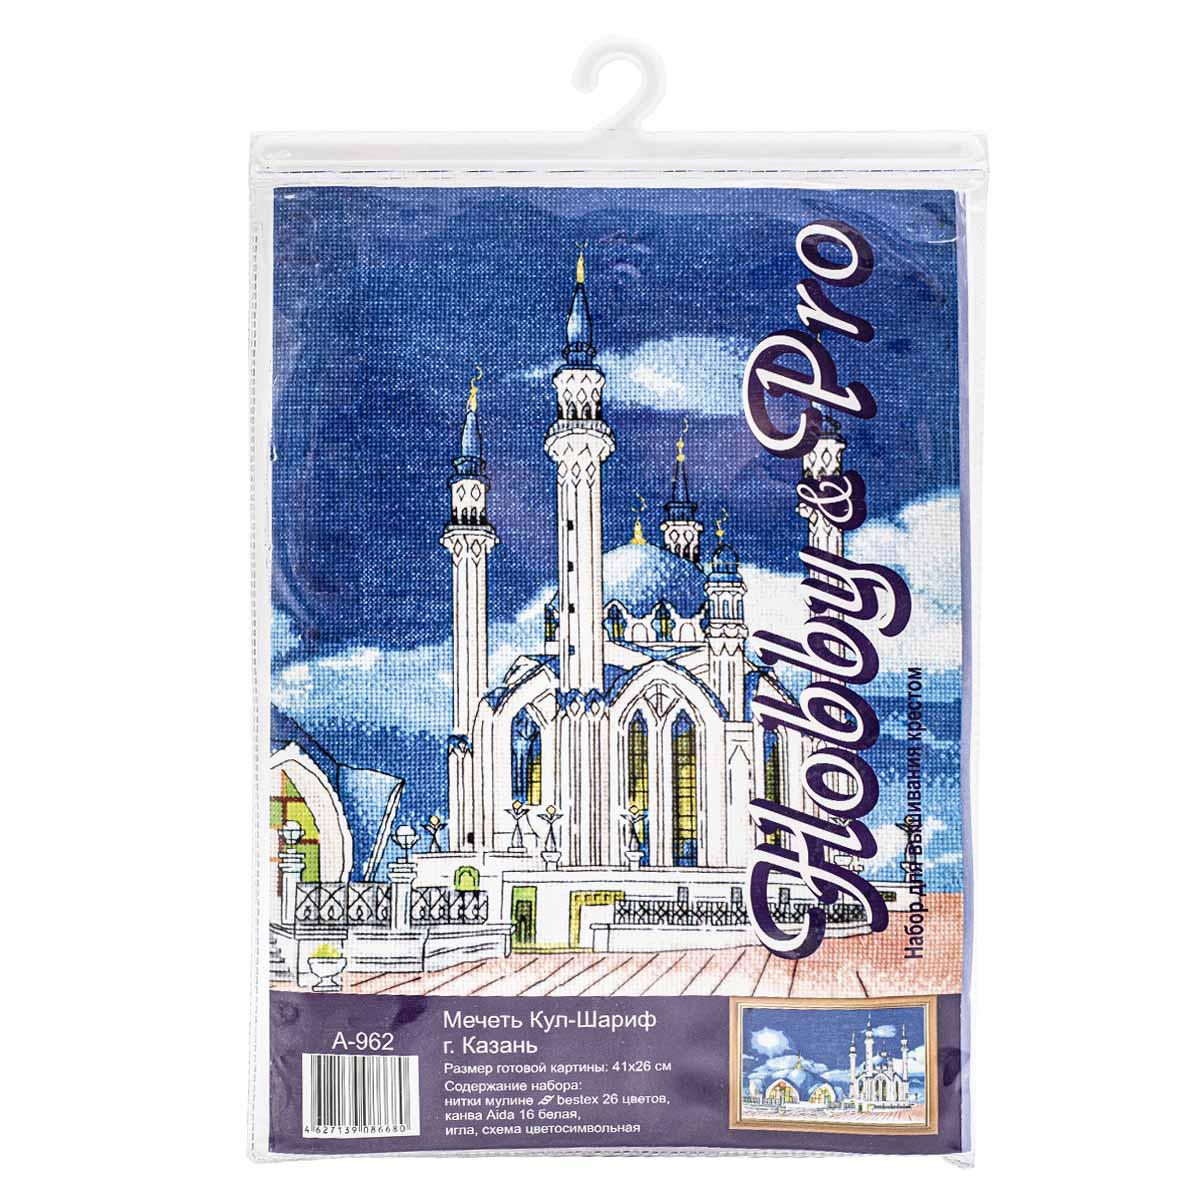 Набор для вышивания'Мечеть Кул-Шариф г. Казань' 41*26см, 962, Hobby&Pro